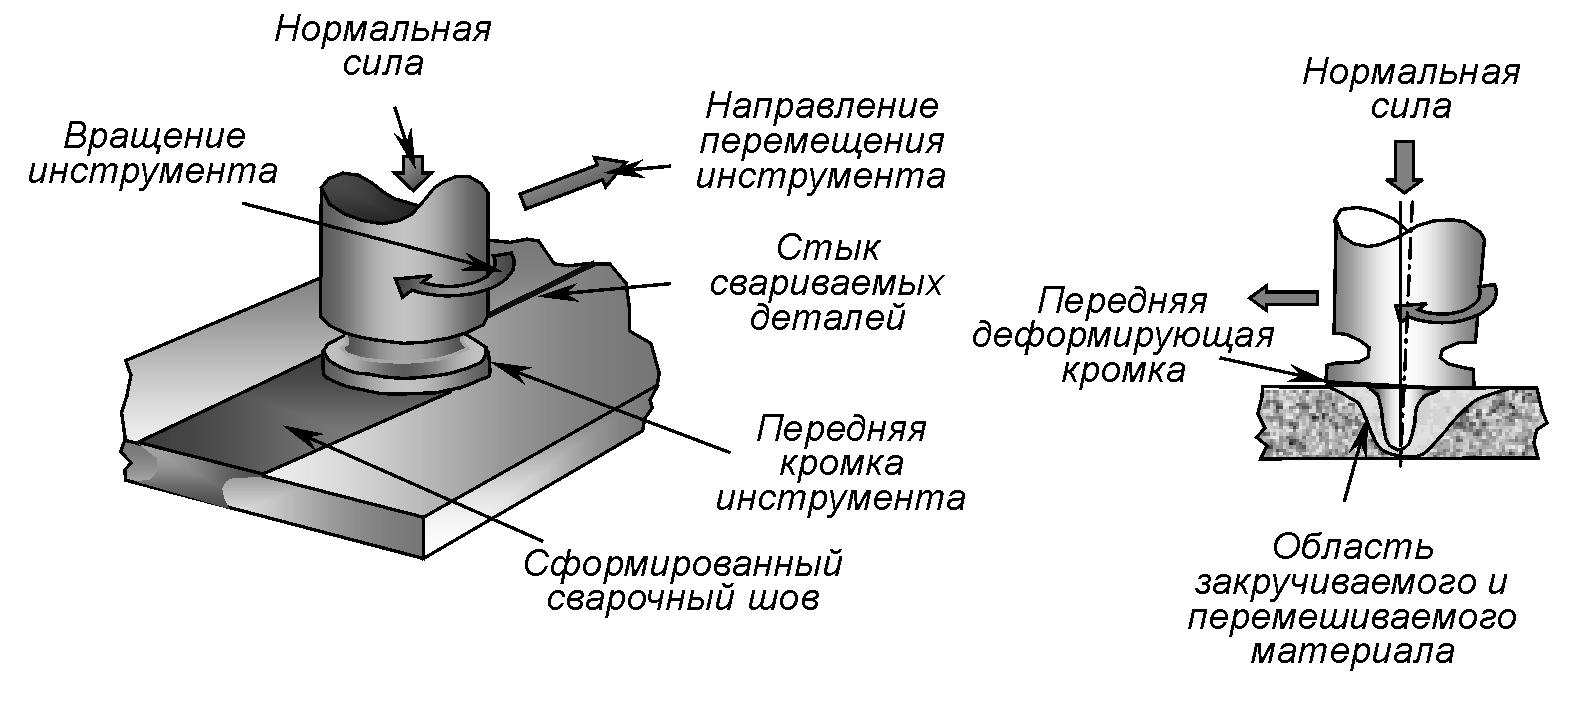 Метод сварки трением с перемешиванием